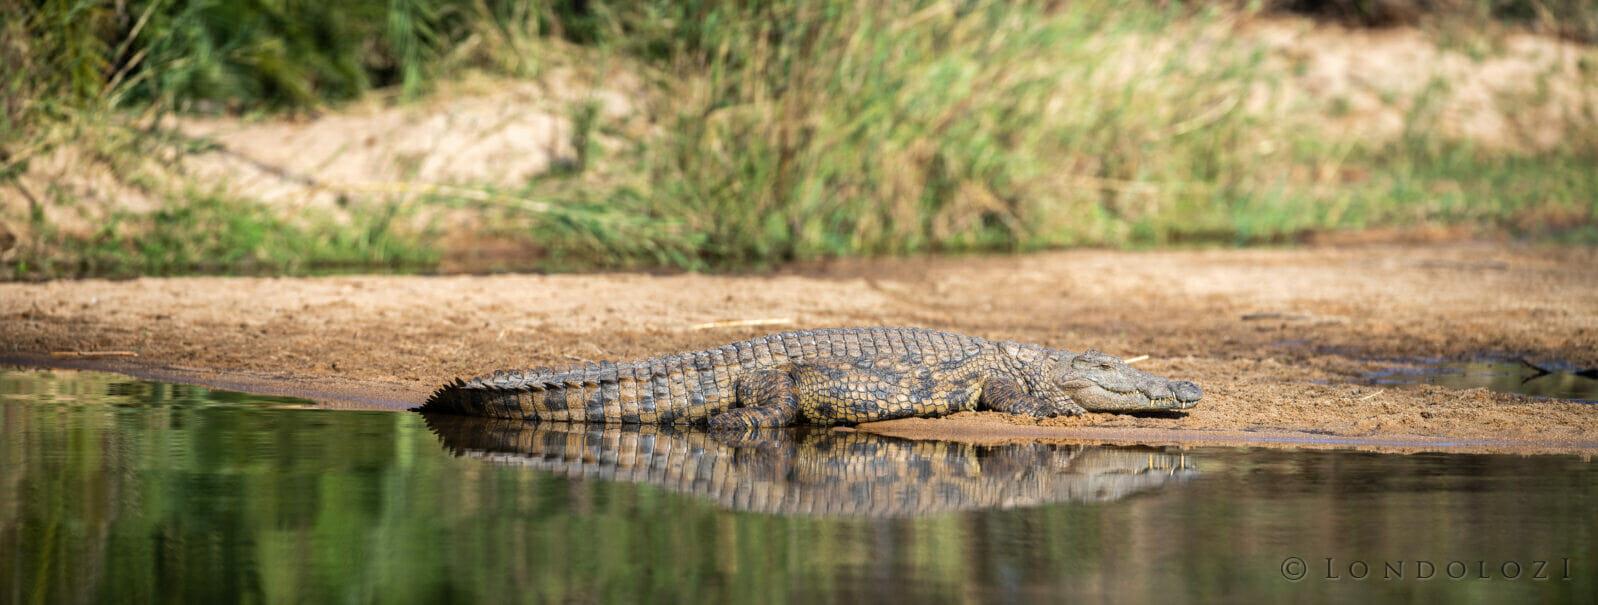 Jts Crocodile Sun Bathing